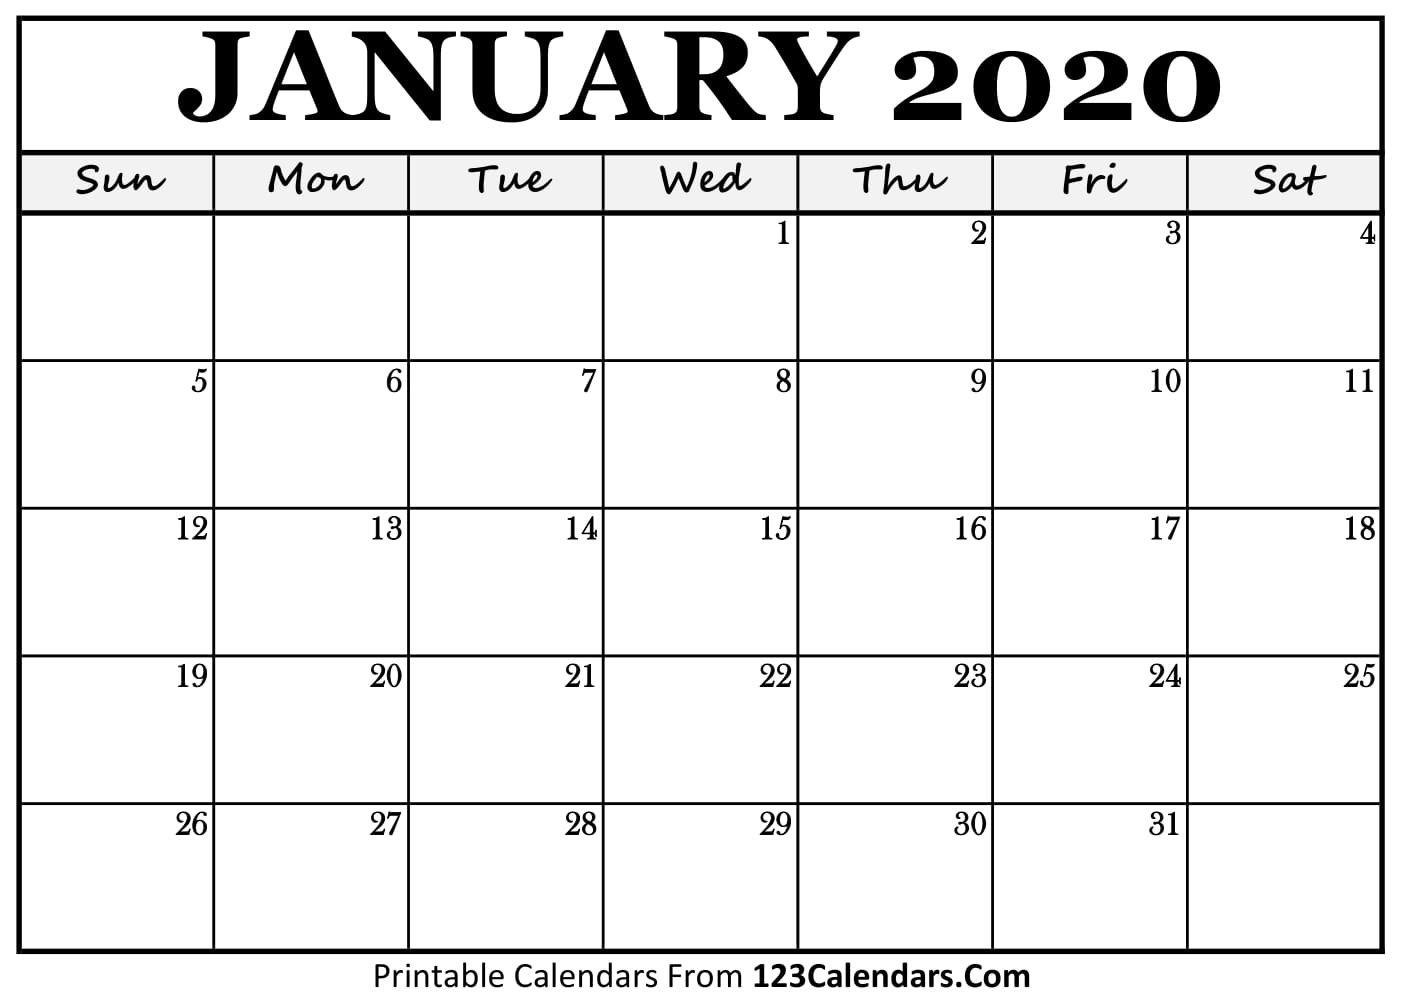 January 2020 Printable Calendar   123Calendars Blank Calendars To Fill In Online